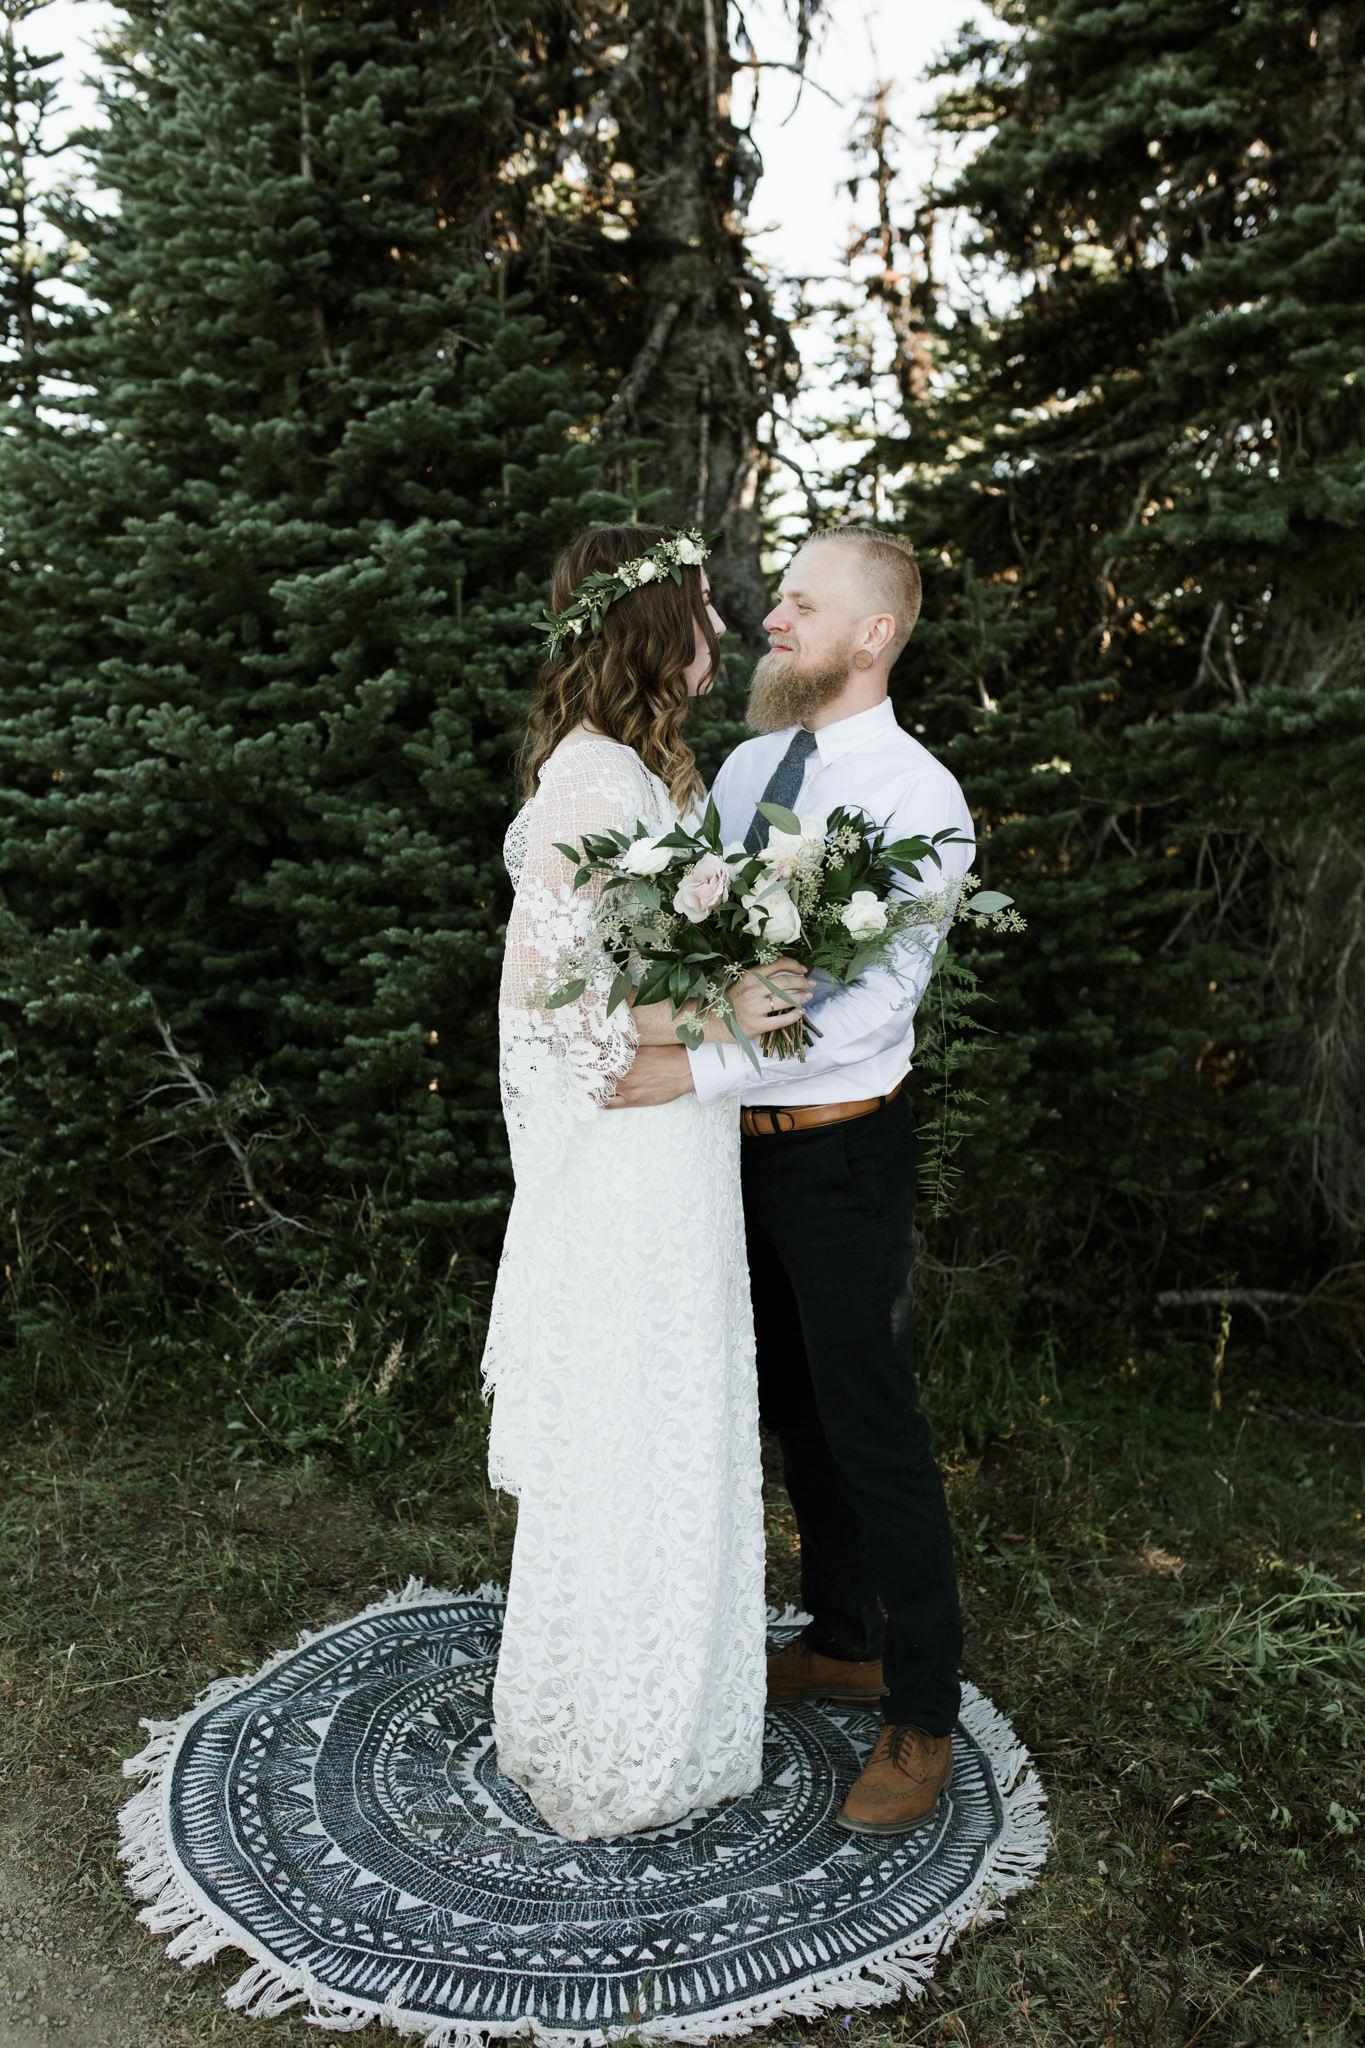 Jesse-Kasie-Hurricane-Ridge-Wedding-13.jpg